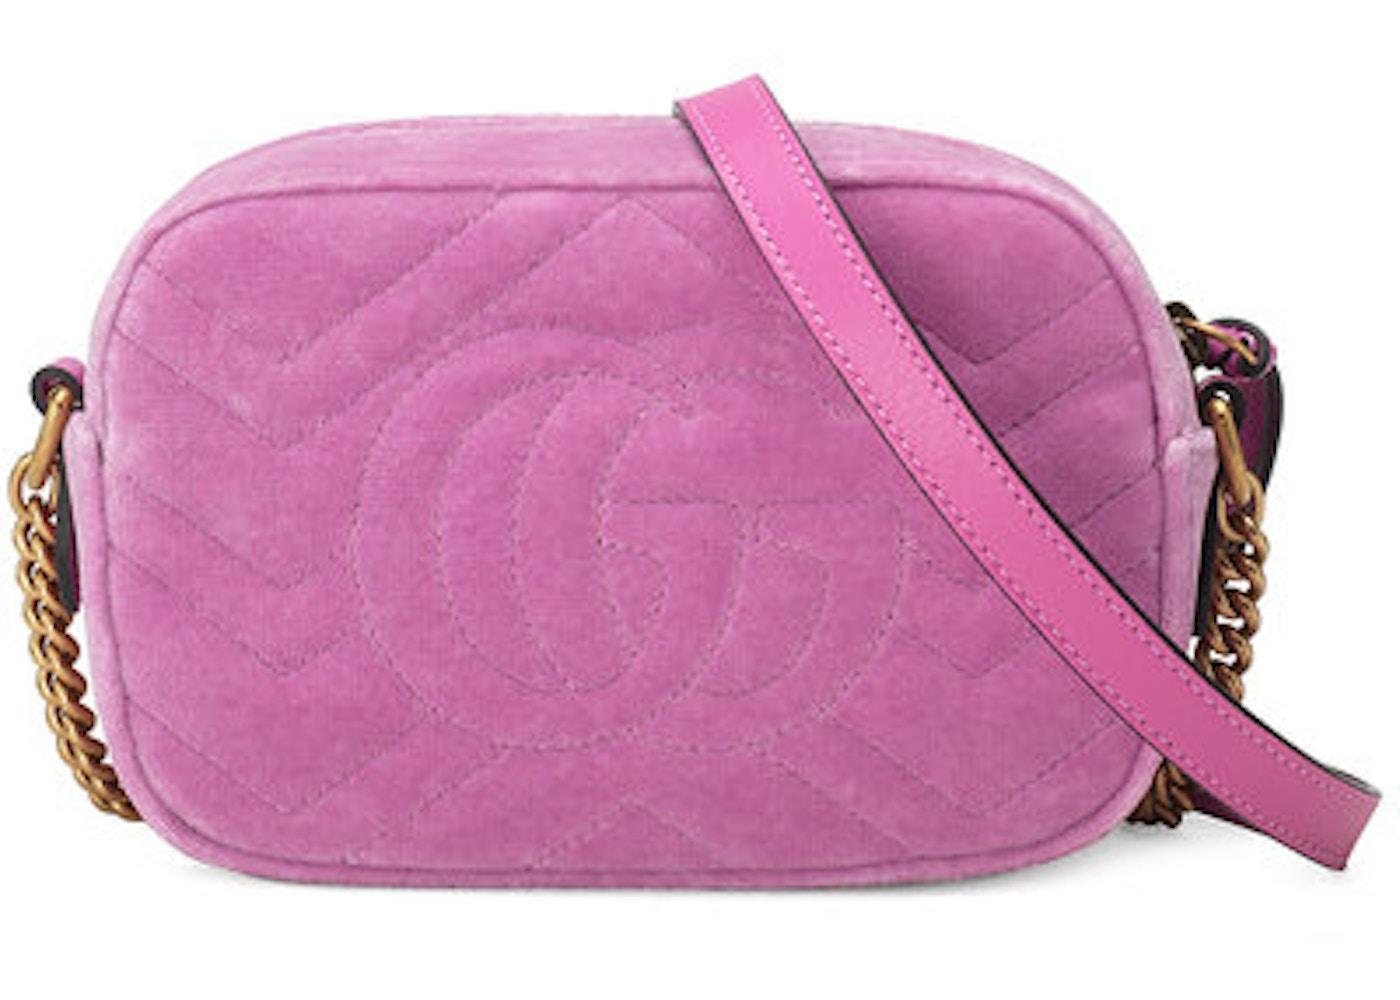 Gucci Shoulder Bag Marmont Matelasse Marquise Crystals Mini Pink